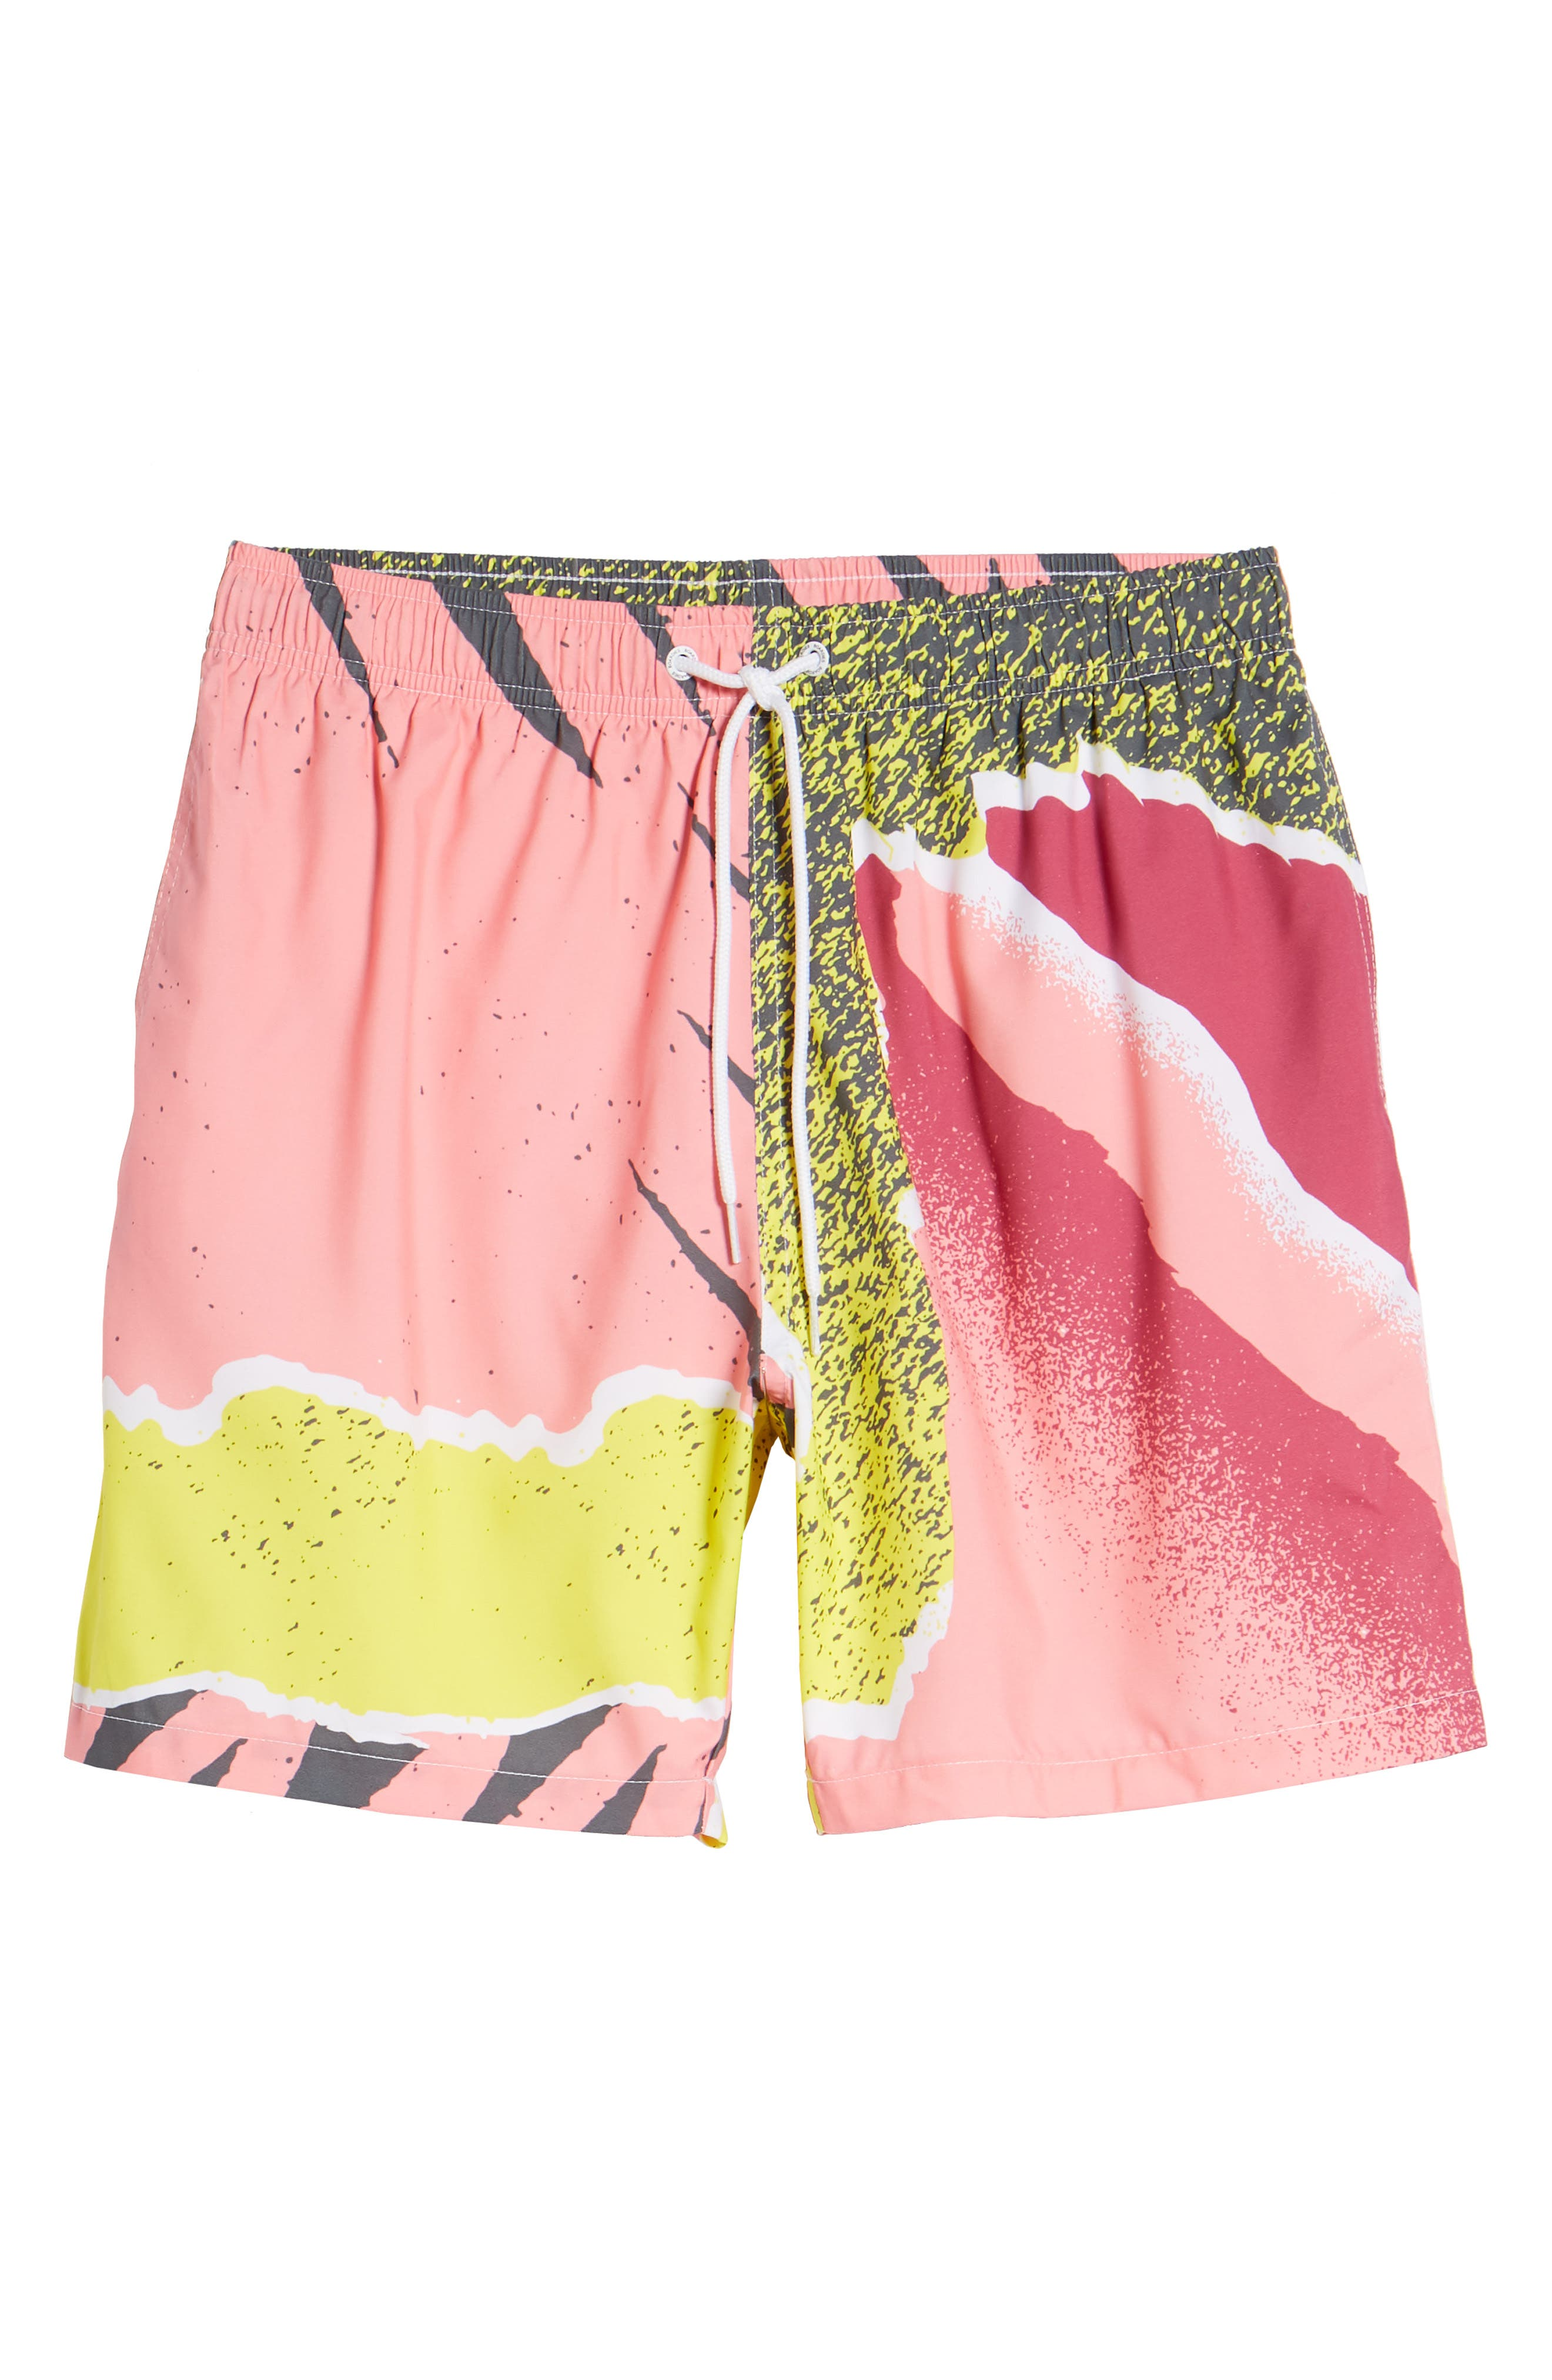 Andre Retro Board Shorts,                             Alternate thumbnail 6, color,                             PINK